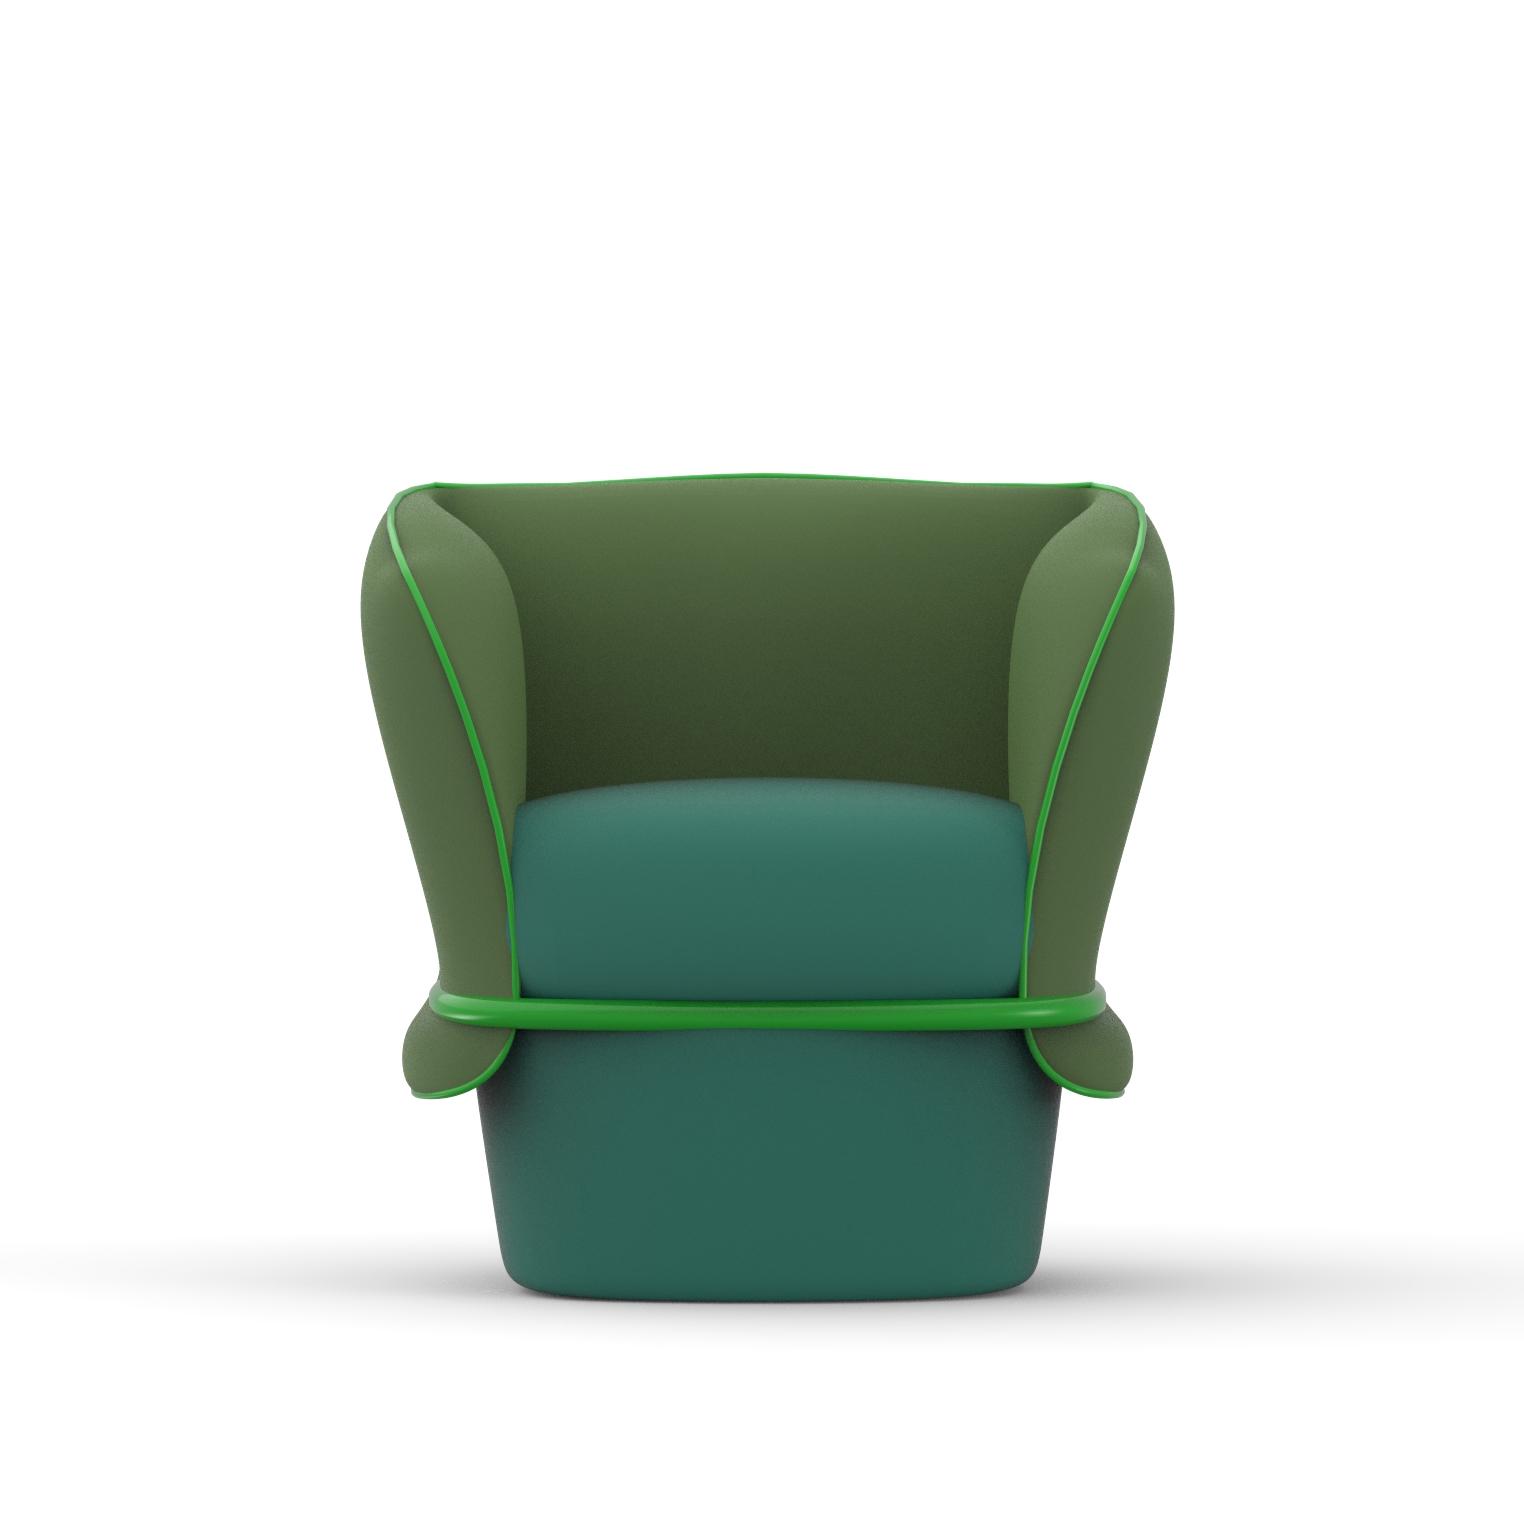 chemise armchair design studio lido for my home collection. laboratore innocenti design office